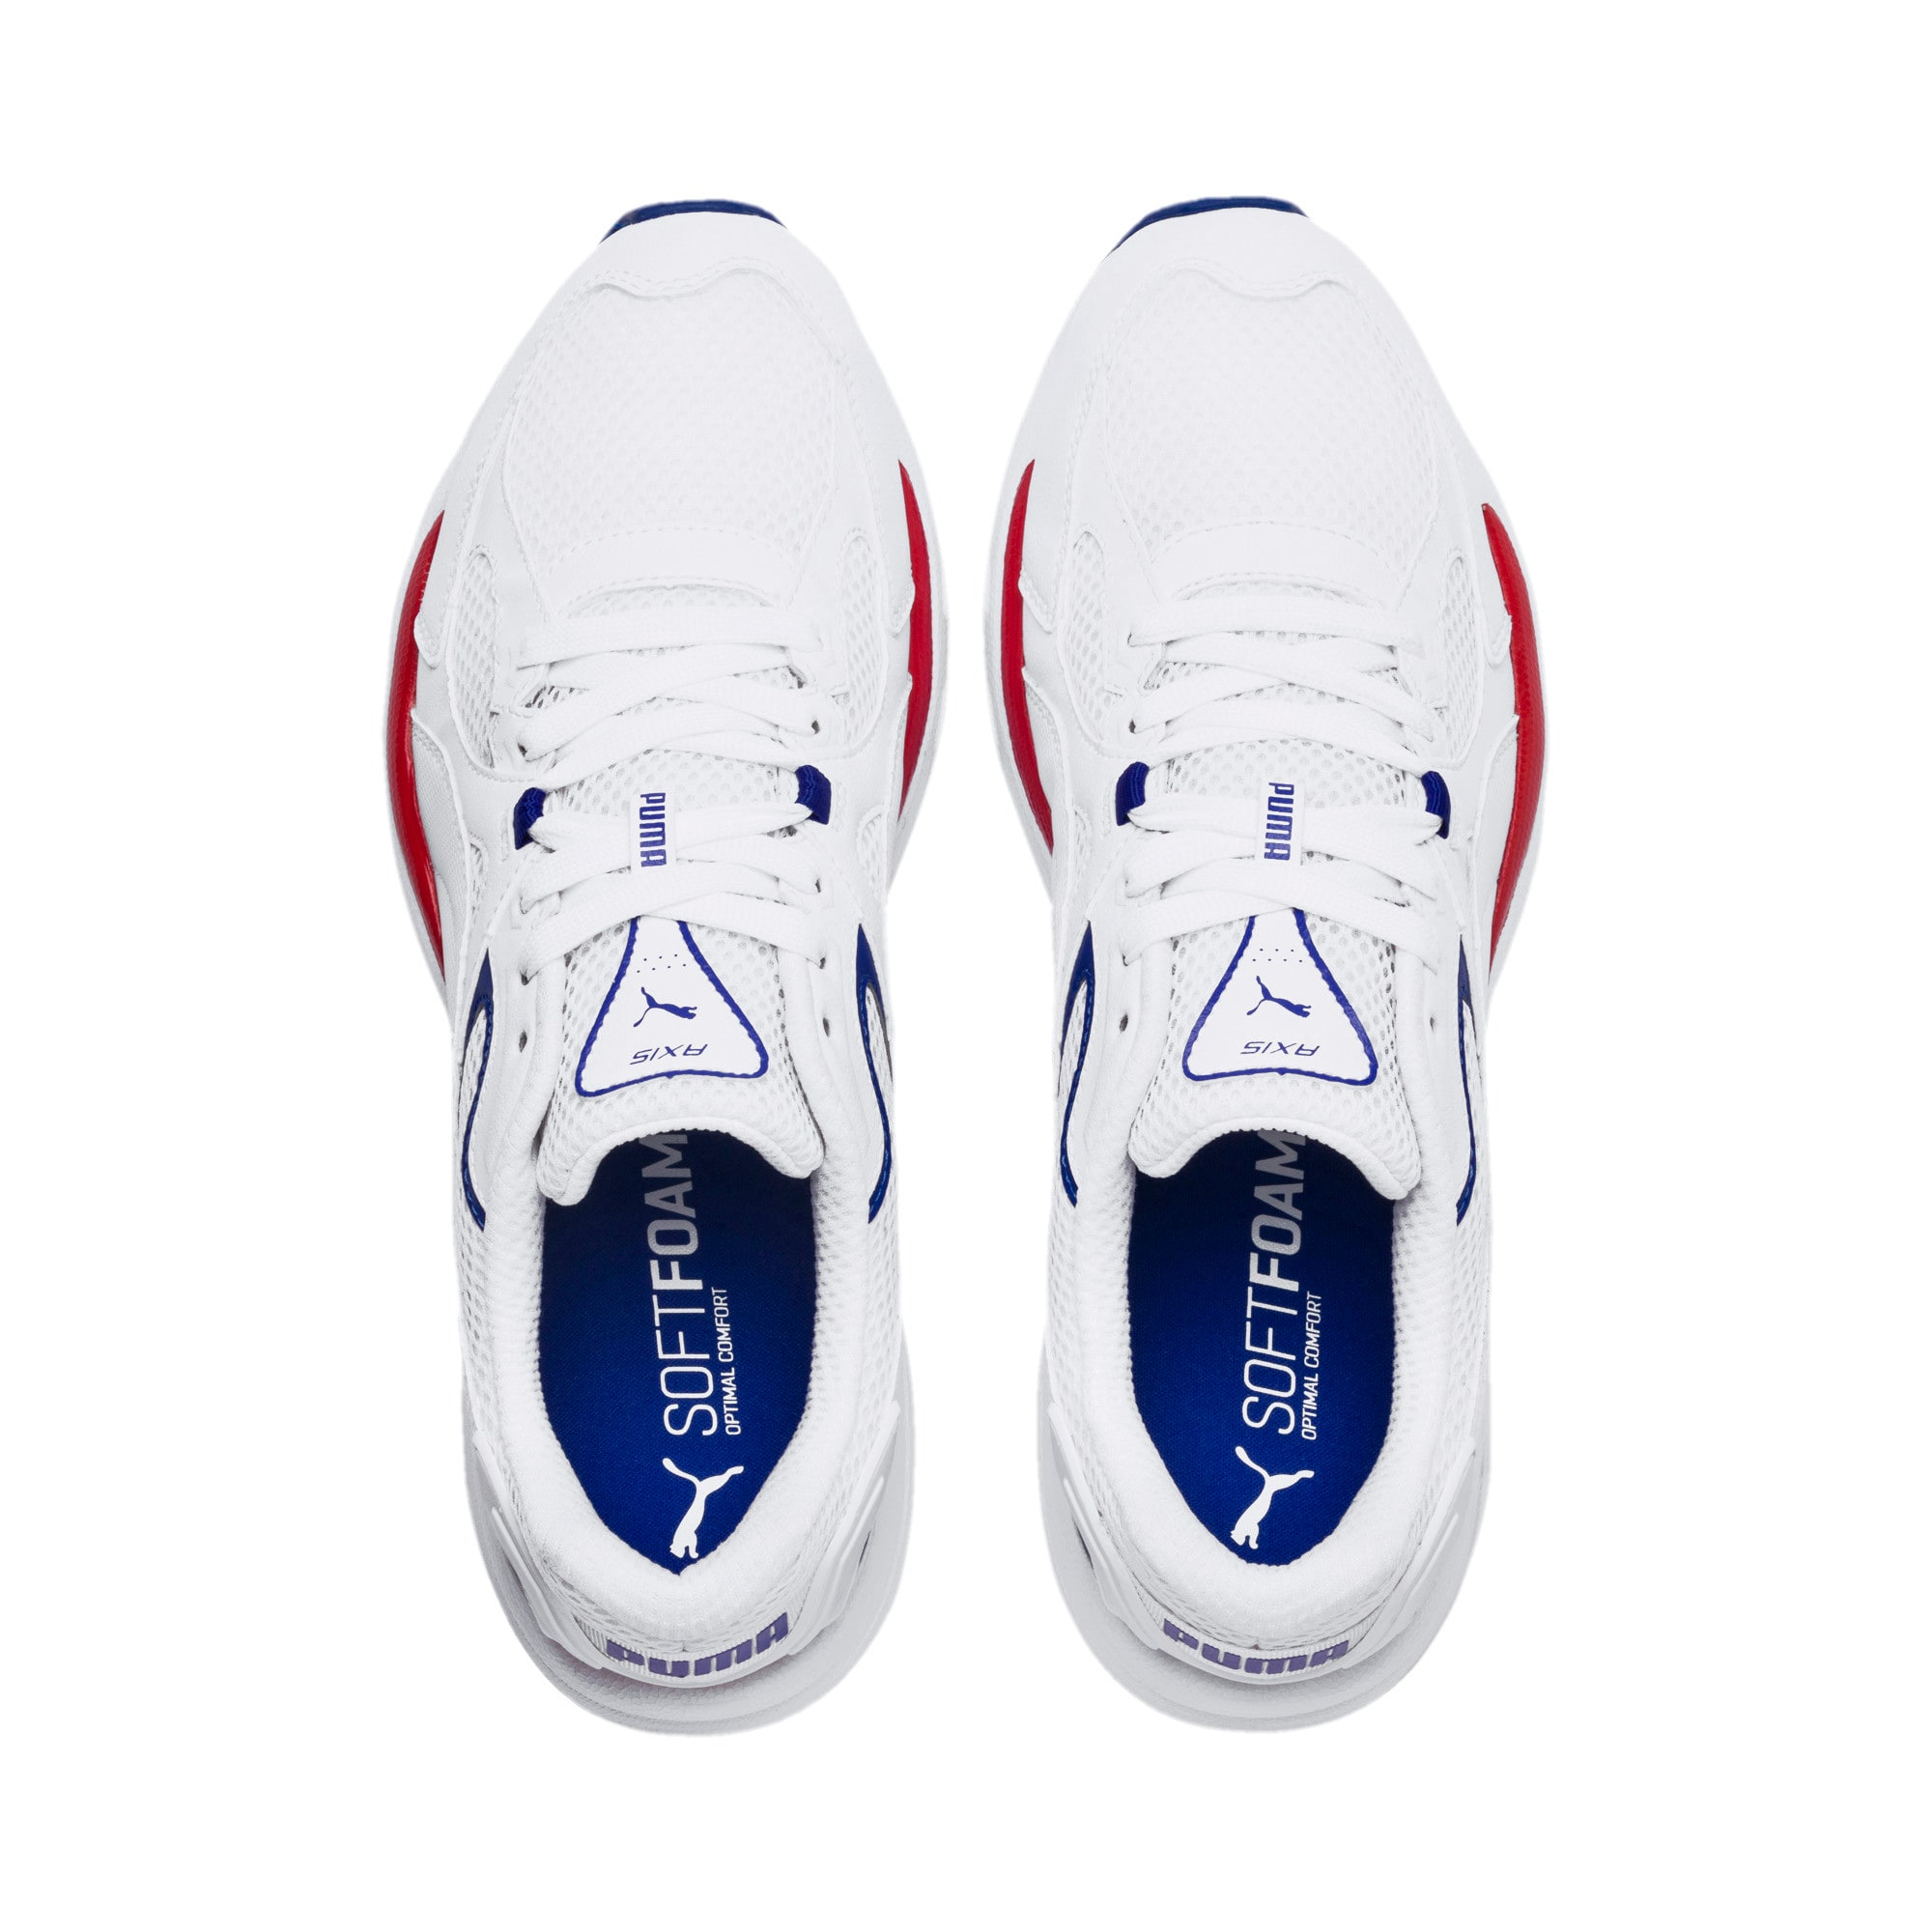 Thumbnail 6 of Axis Plus 90s Sneakers, Puma White-Puma White, medium